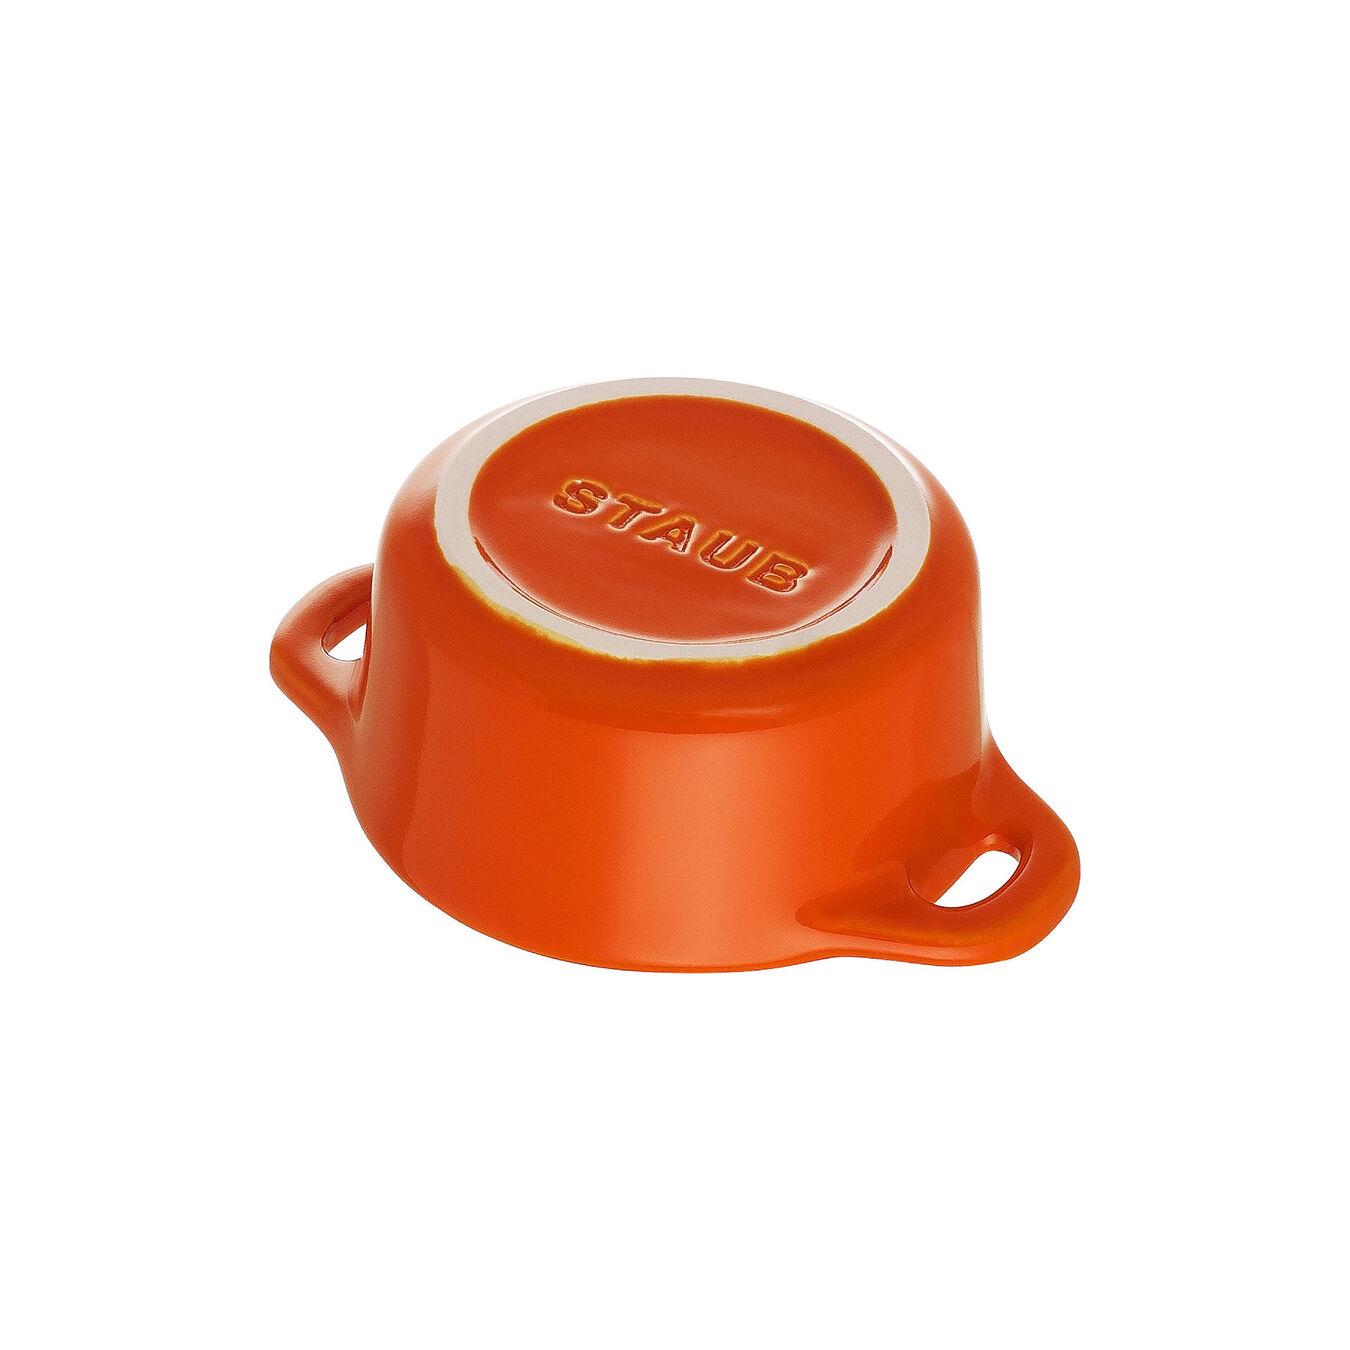 Mini Cocotte 10 cm, Rund, Orange, Stentøj,,large 5